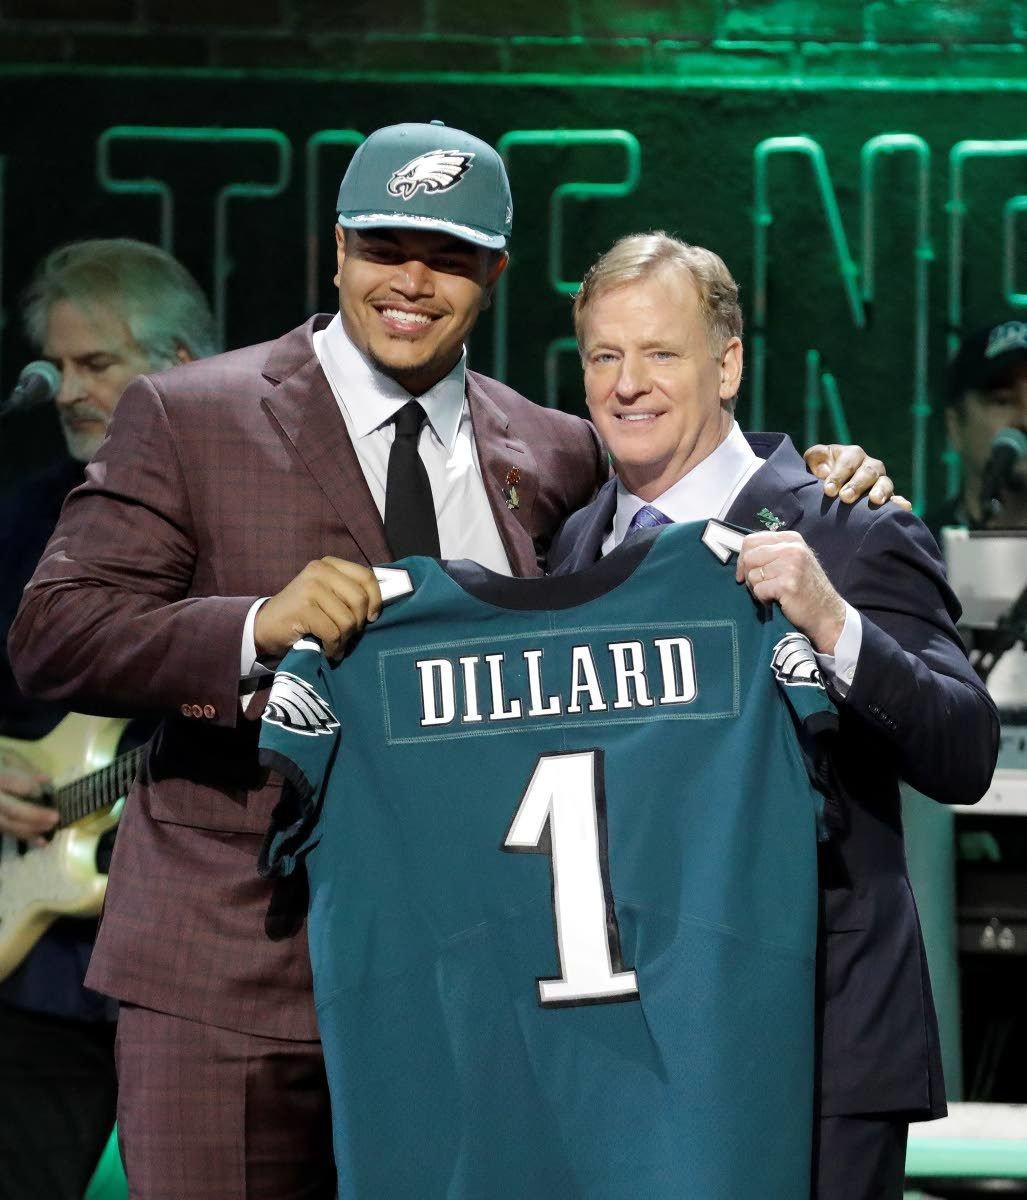 411ad36c211 Eagles pick Dillard in 1st round